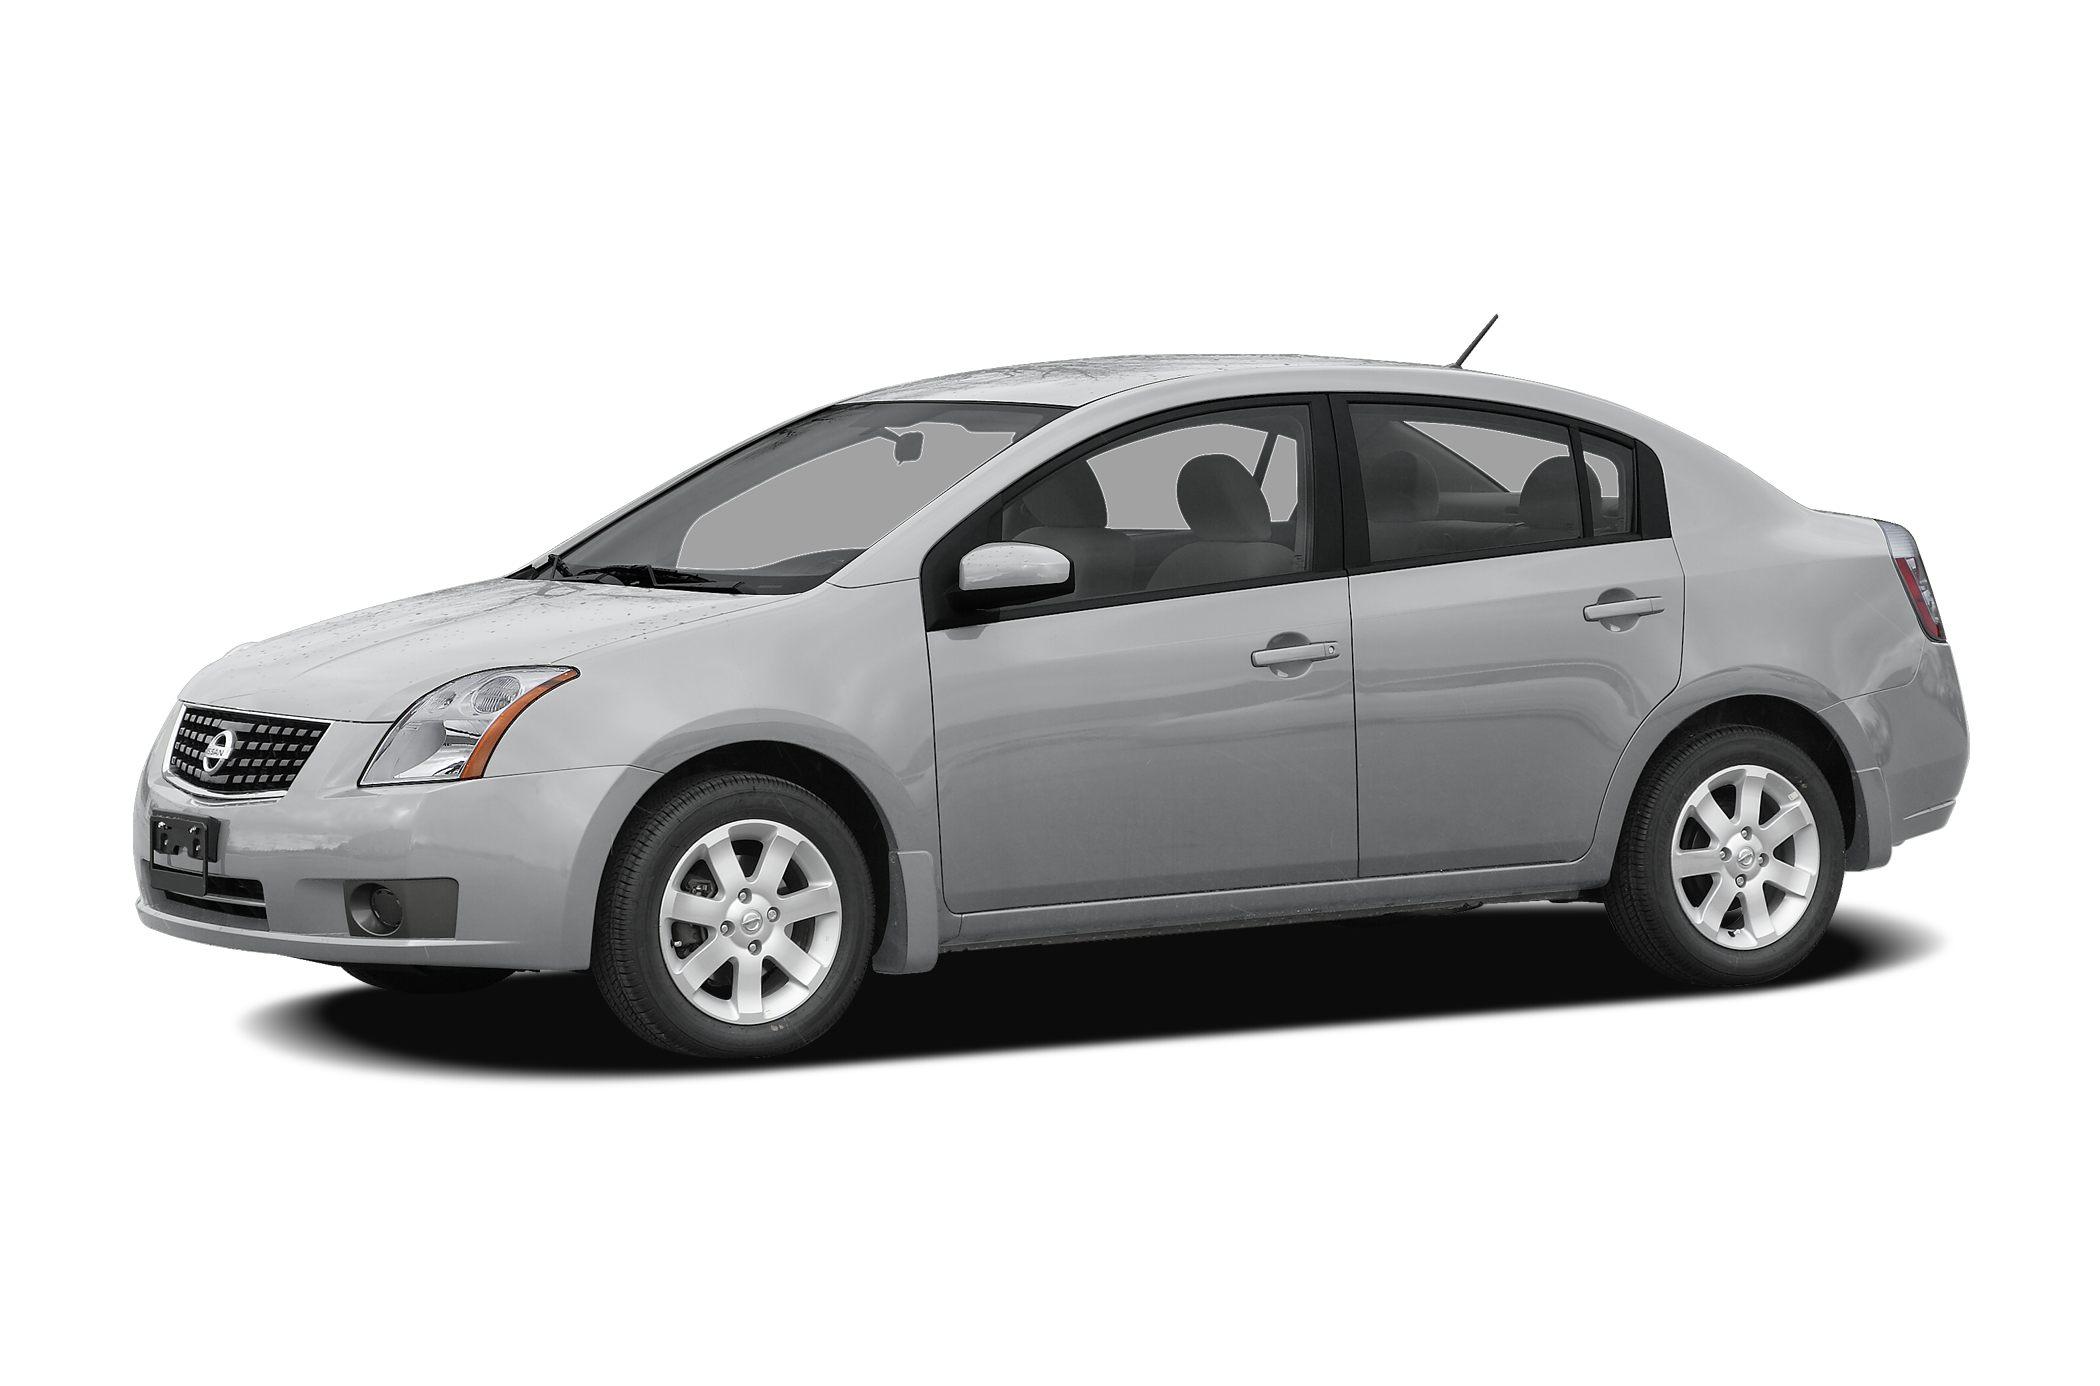 2007 Nissan Sentra  Miles 96279Color Gray Stock 16622R VIN 3N1AB61E07L646134